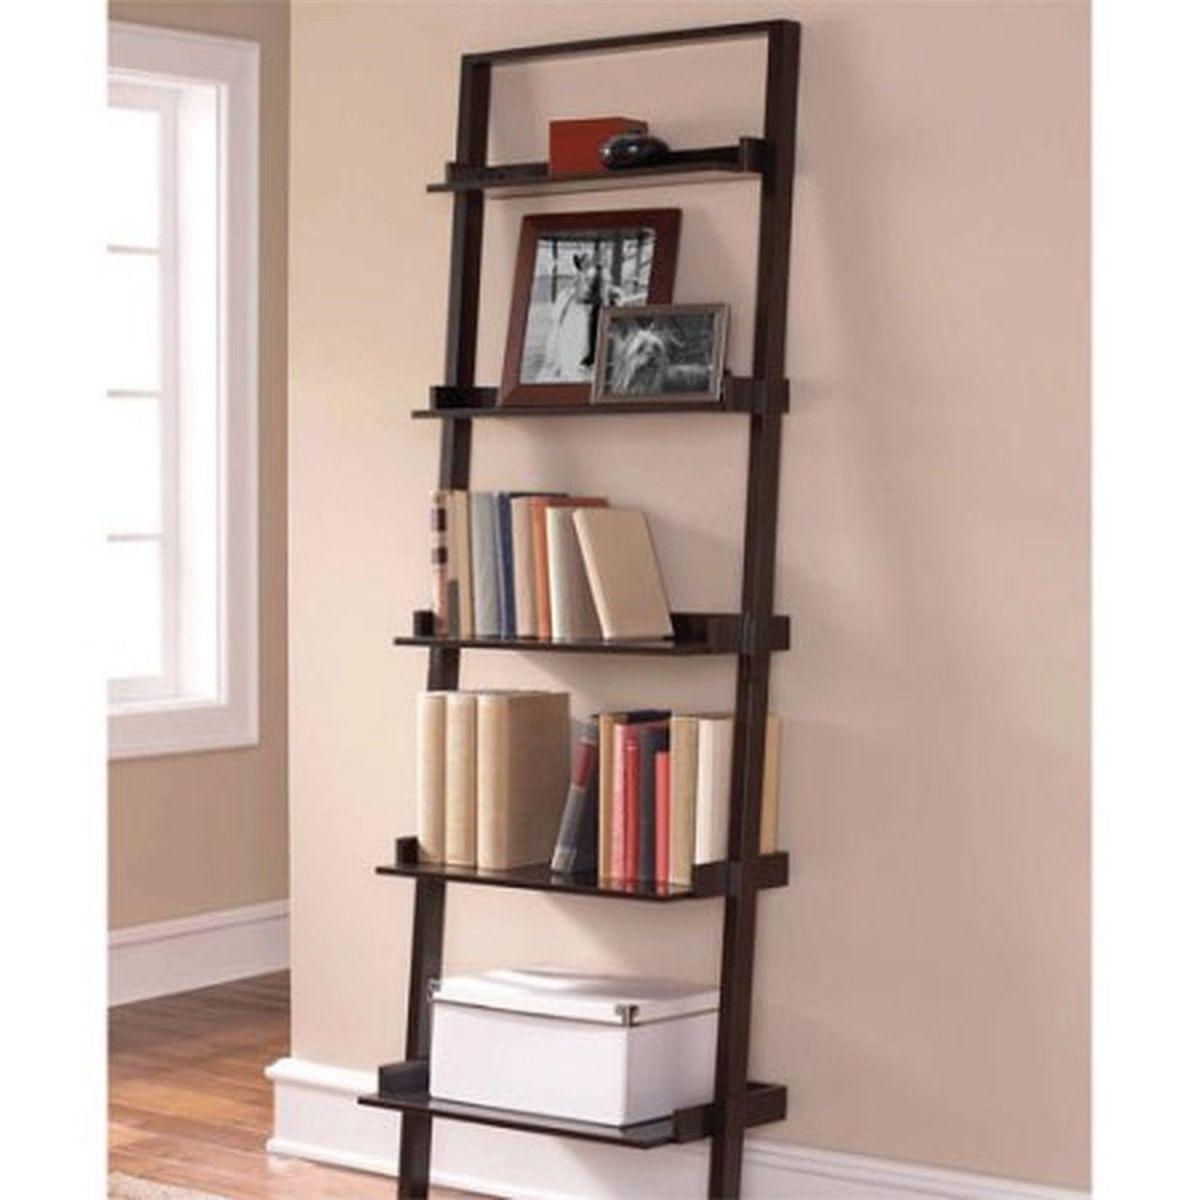 5-Shelf-Storage-Rack-Espresso-Bookcase-Wood